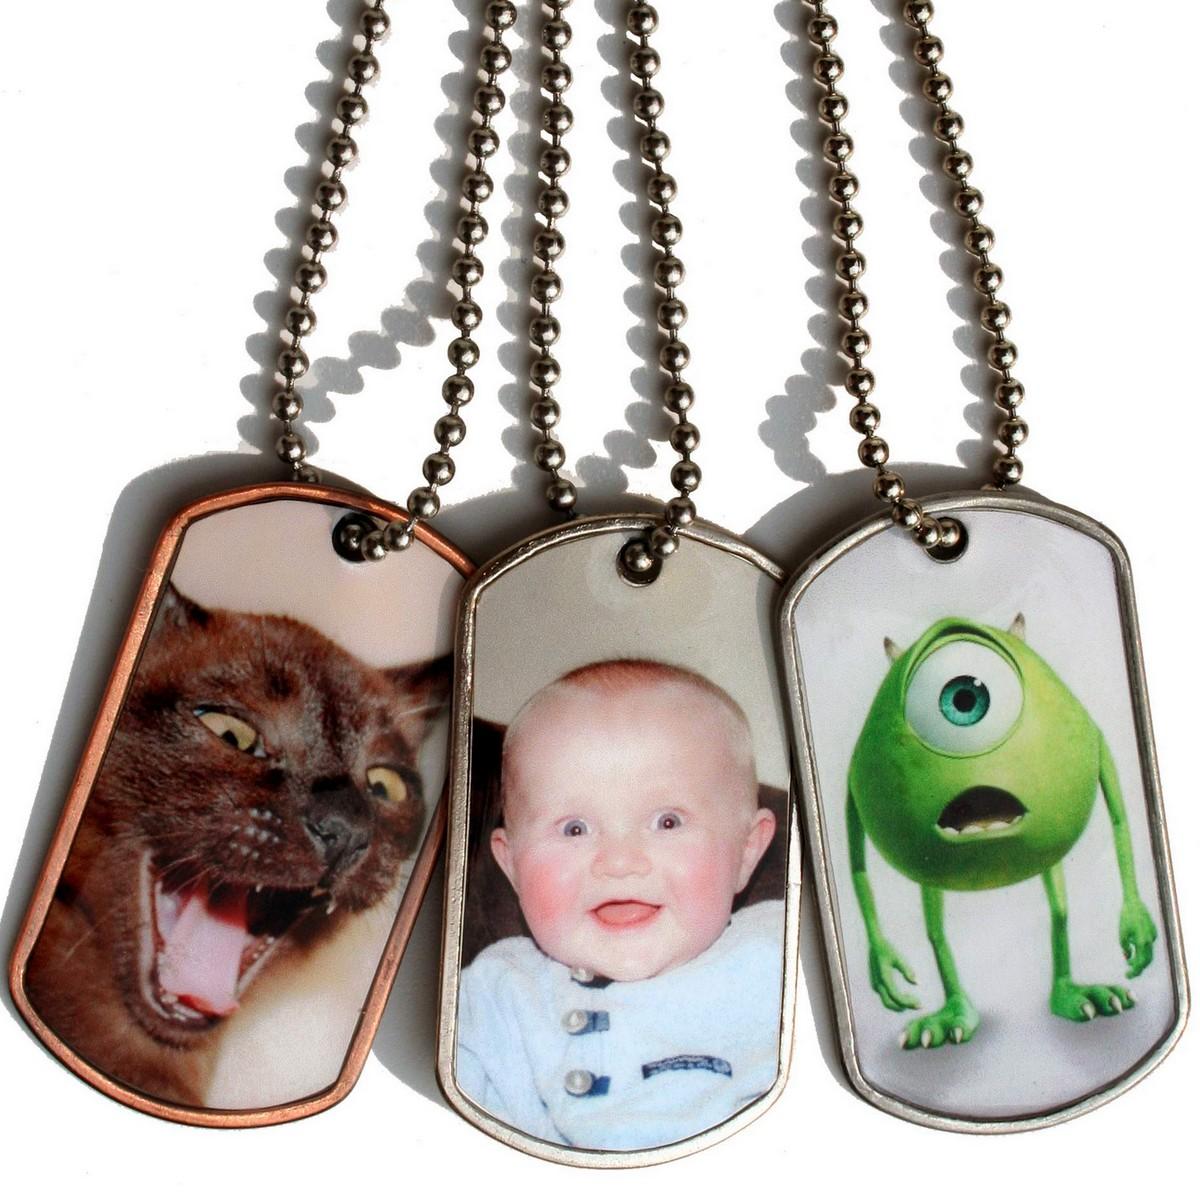 ID tag met foto bij AnimalWebshop.com